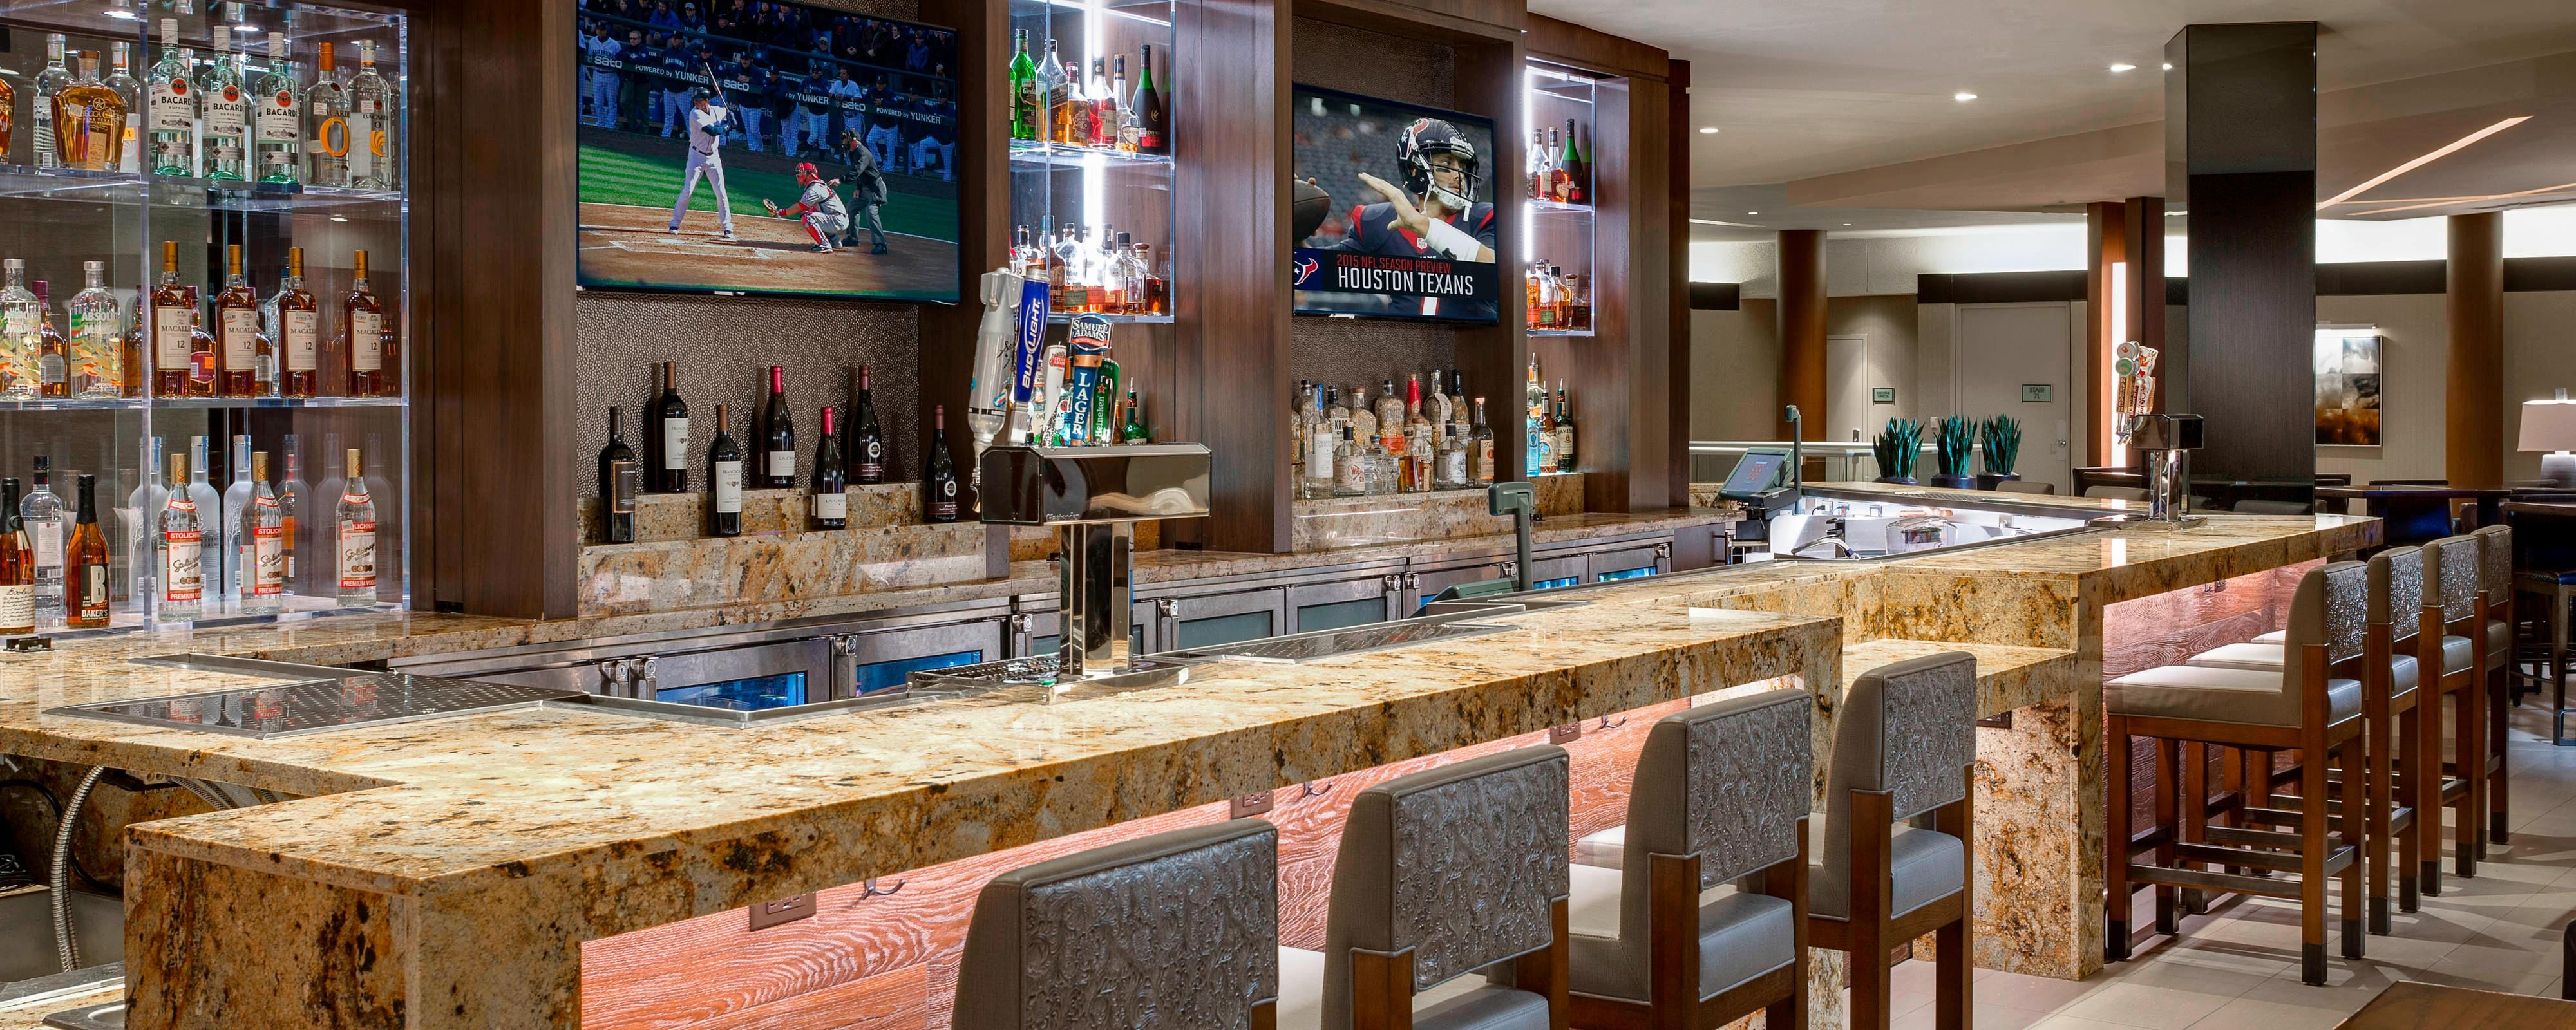 Houston Airport Restaurant Houston Airport Marriott At